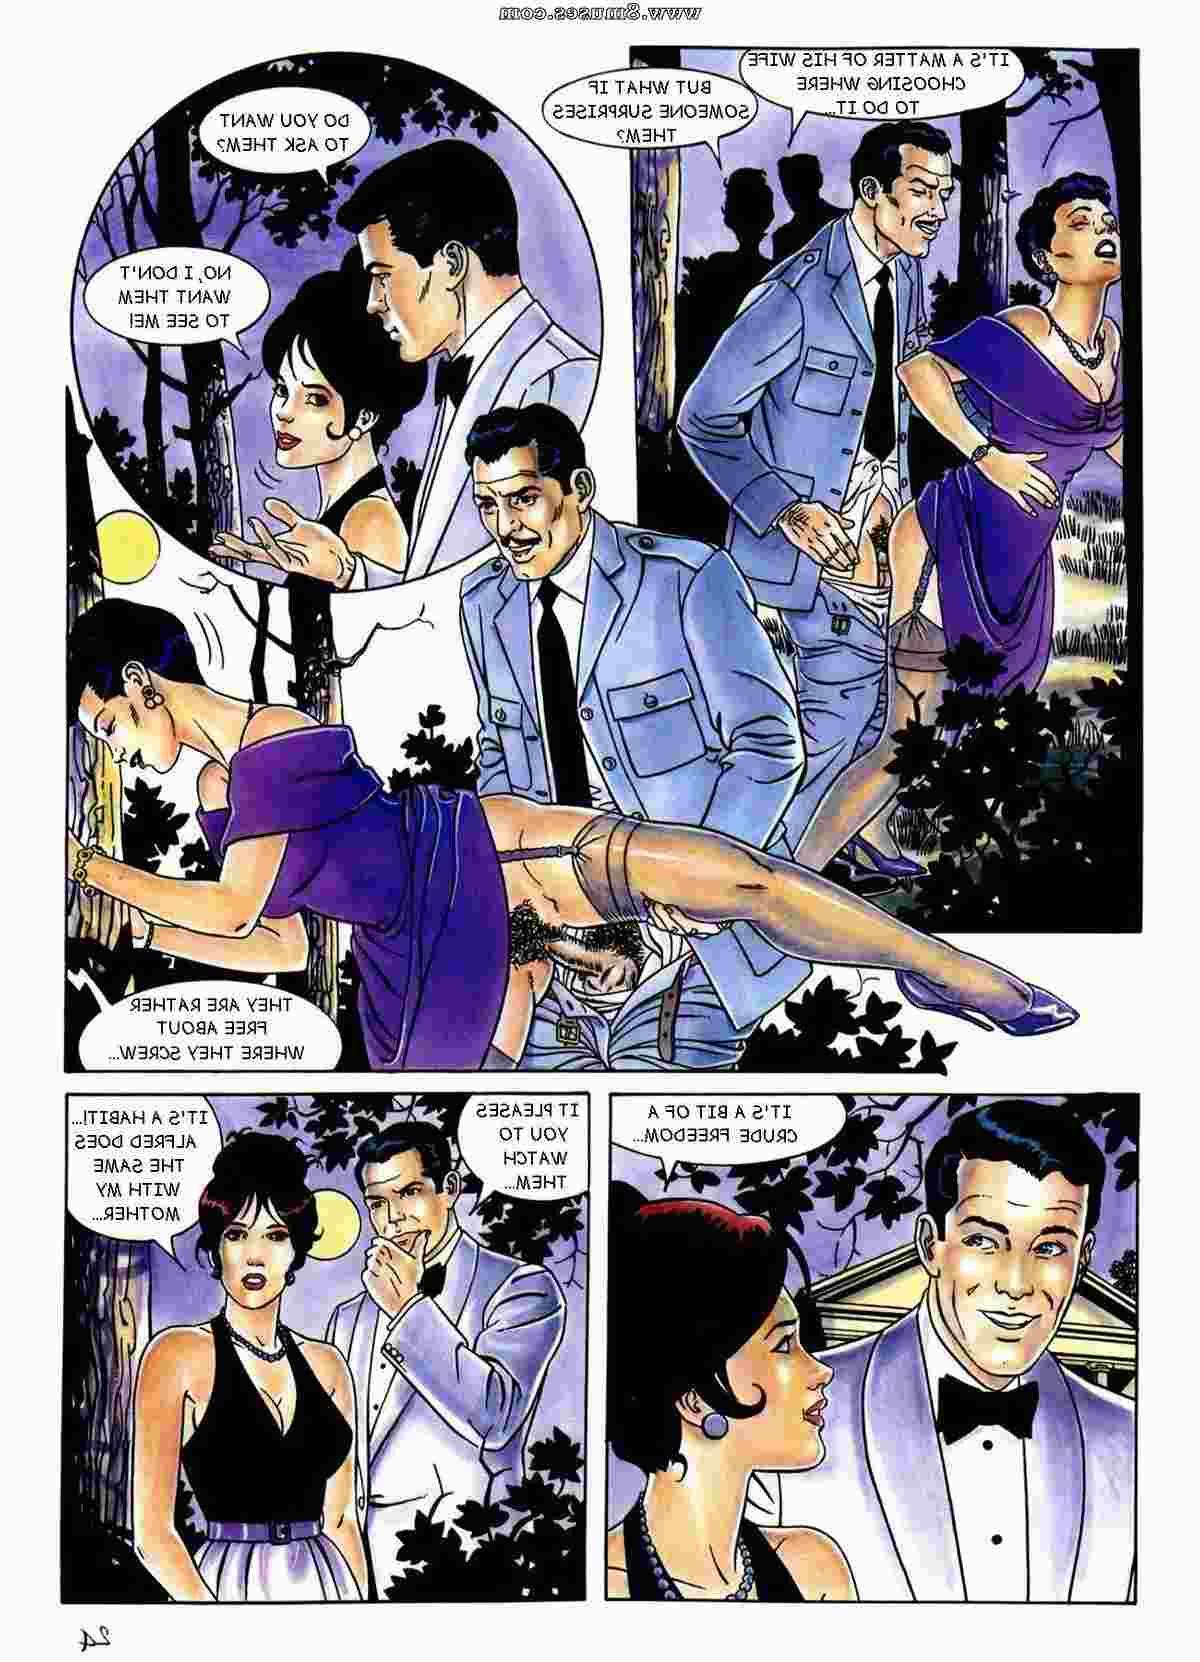 Stramaglia-Morale-Comics/Anna-Perverted-Innocence Anna_Perverted_Innocence__8muses_-_Sex_and_Porn_Comics_27.jpg